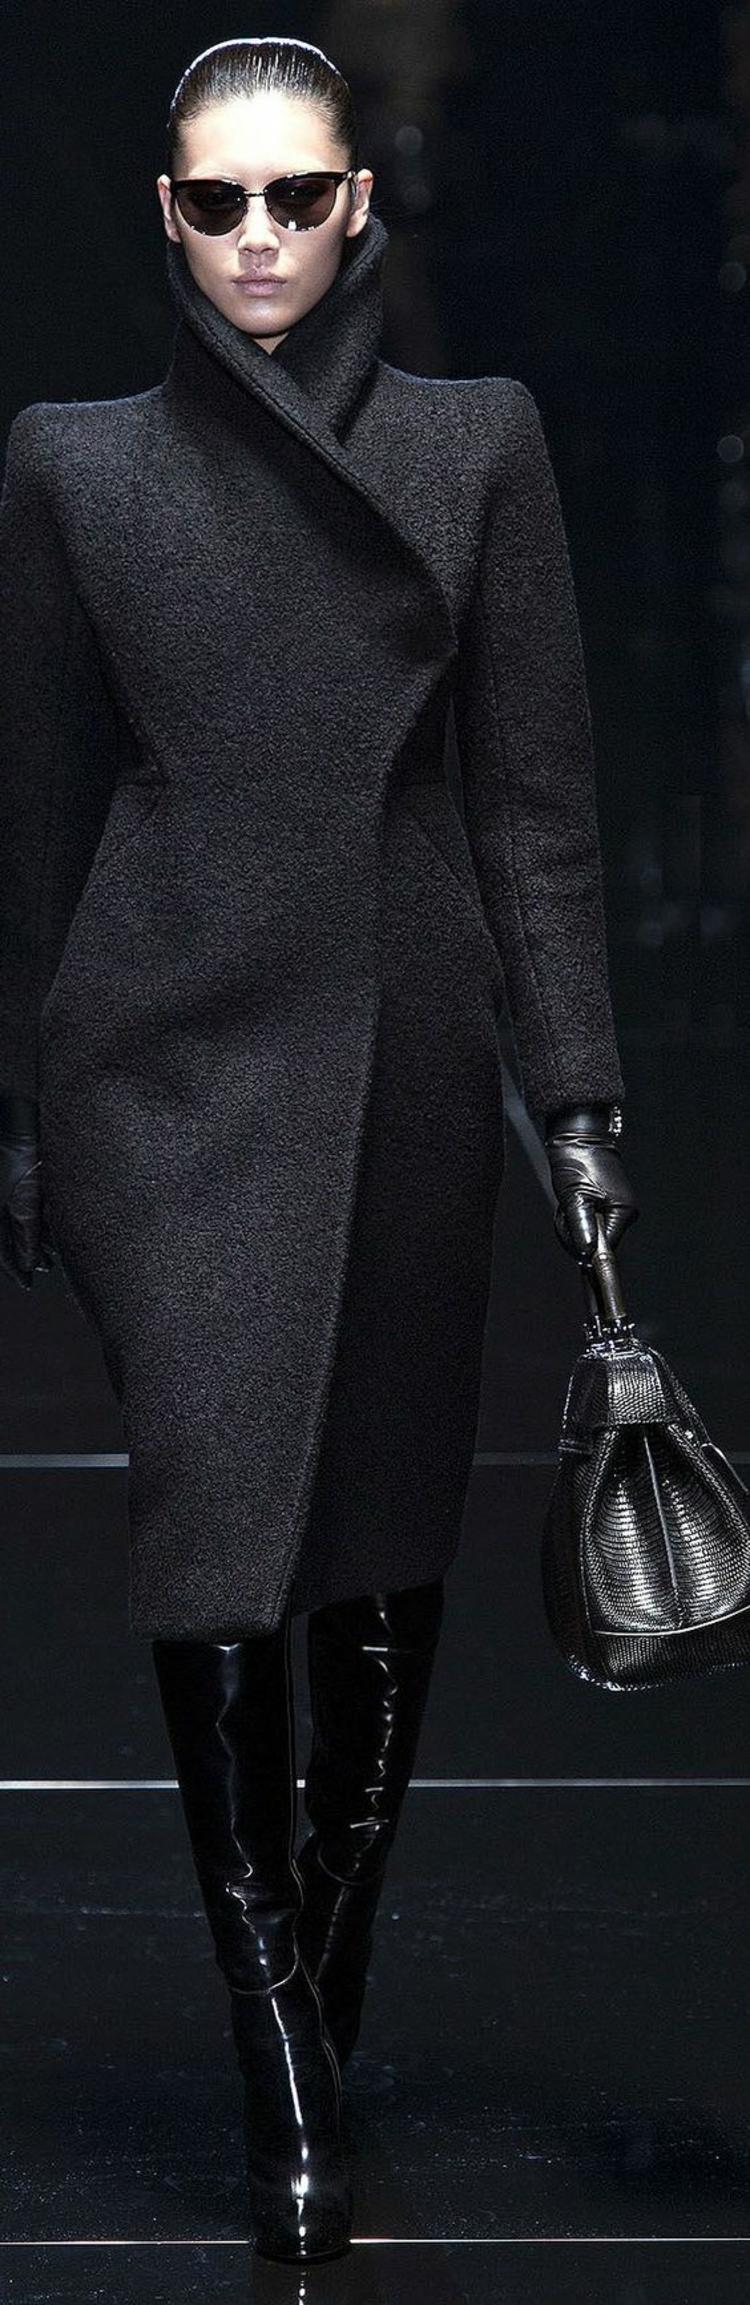 Damenmantel lang schwarz Wintermode Damen